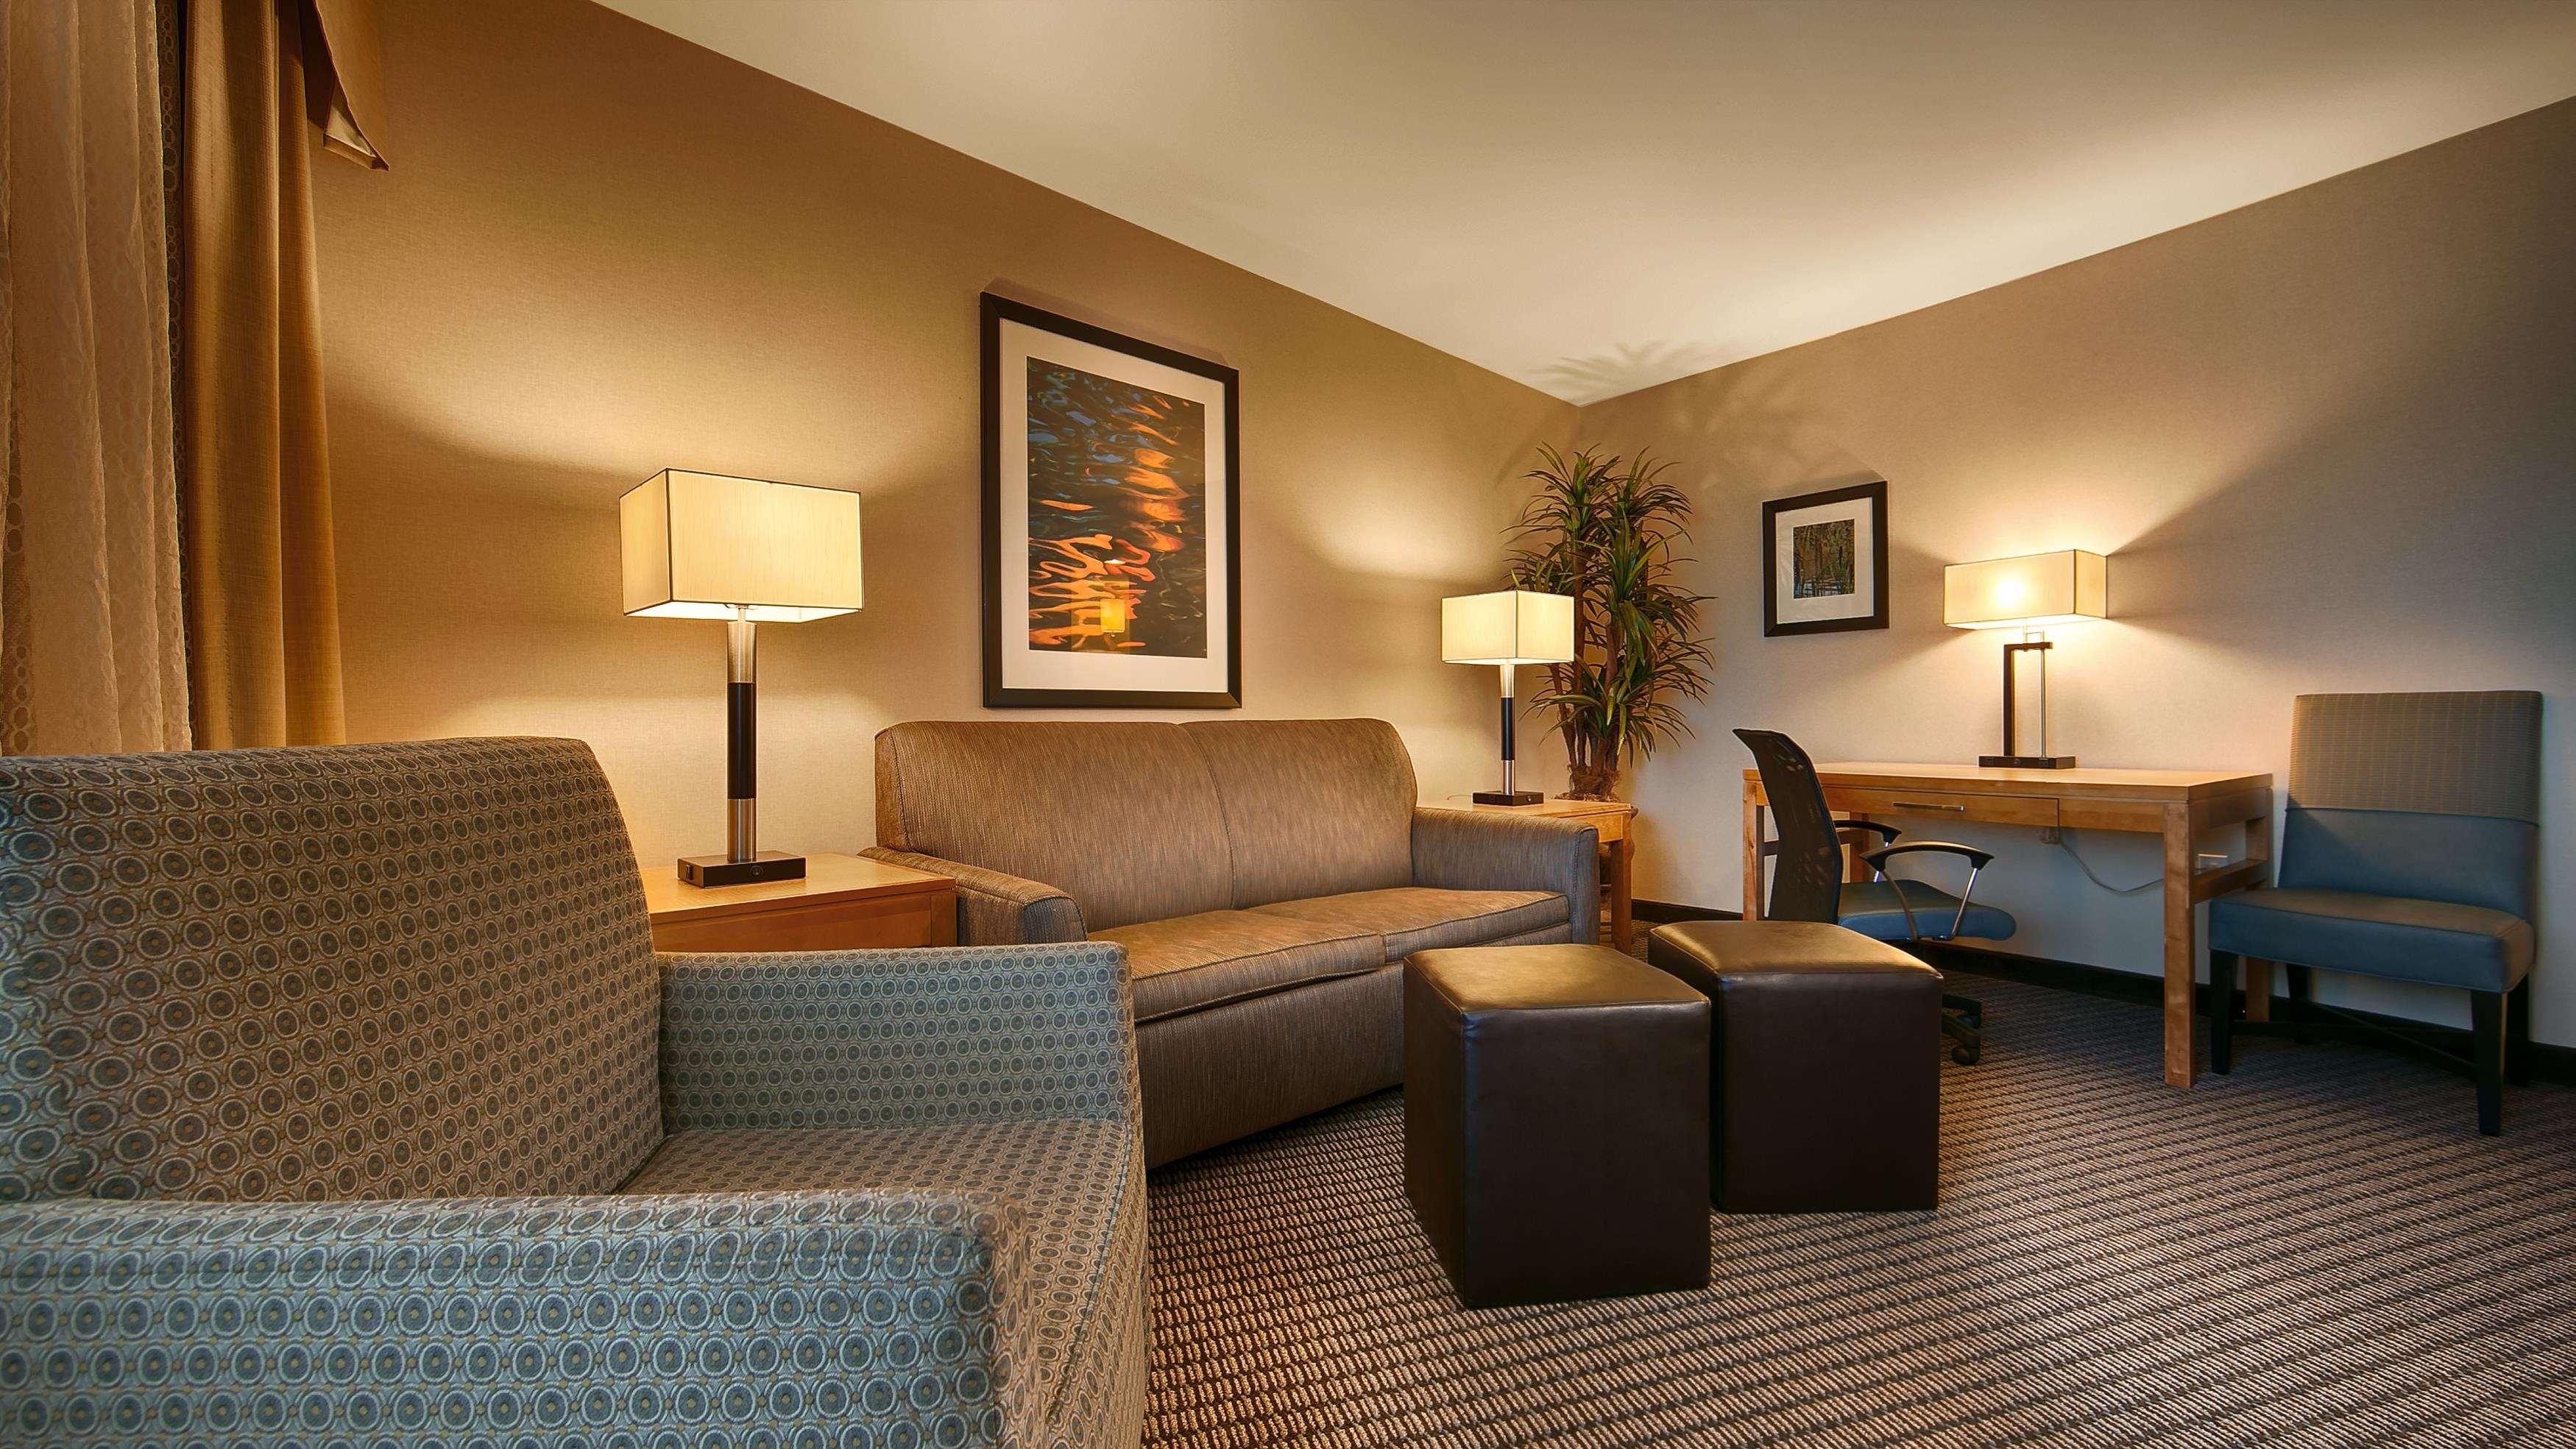 Best Western Plus Marina Gateway Hotel image 7